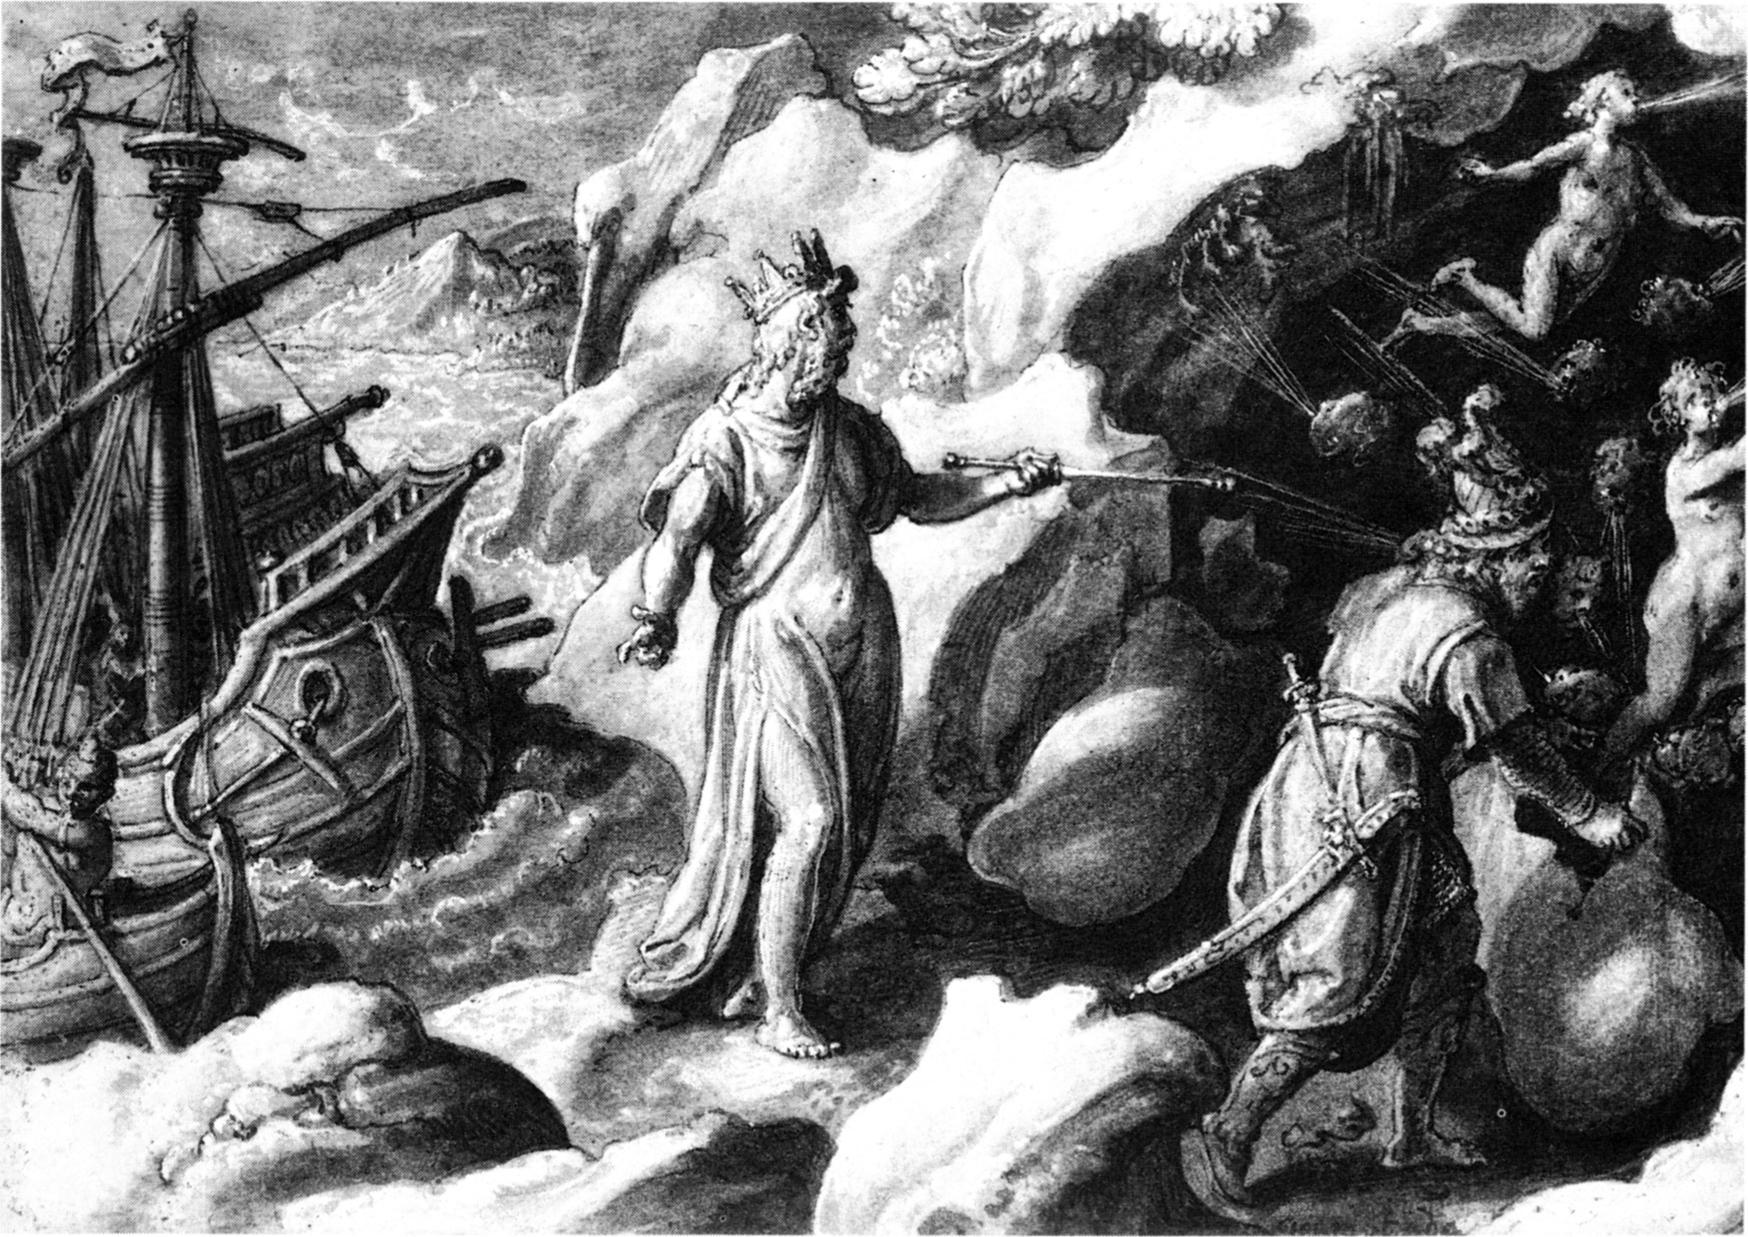 polyphemus odysseus relationship with the gods